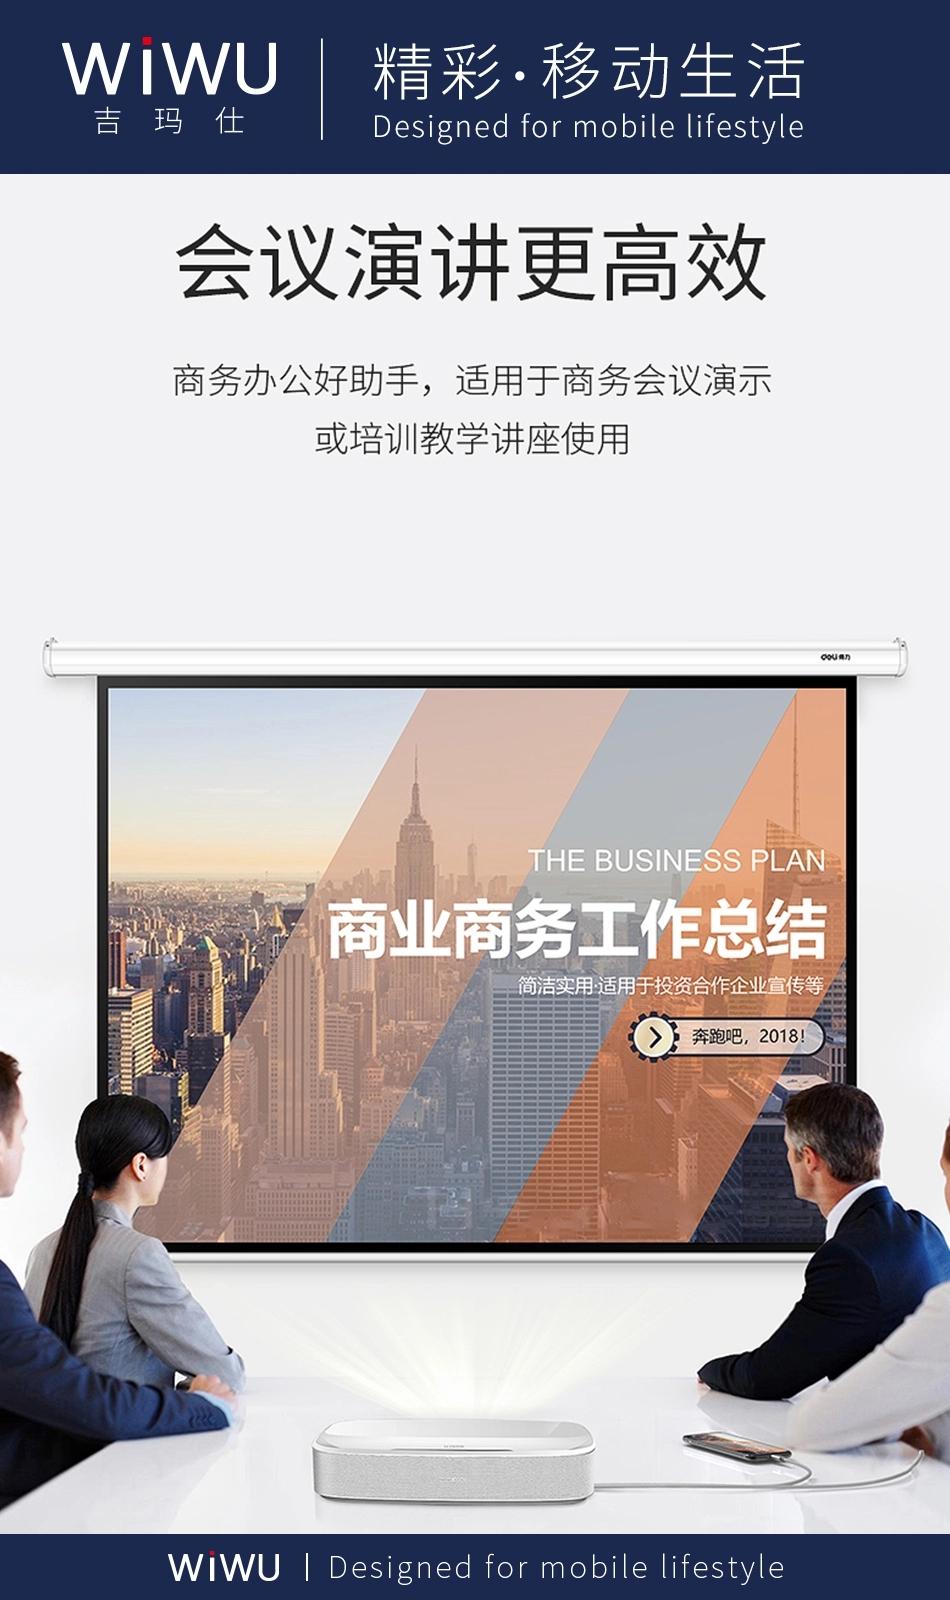 WIWU 苹果HDMI视频输出数据线 (https://www.wiwu.net.cn/) 数据线 第4张